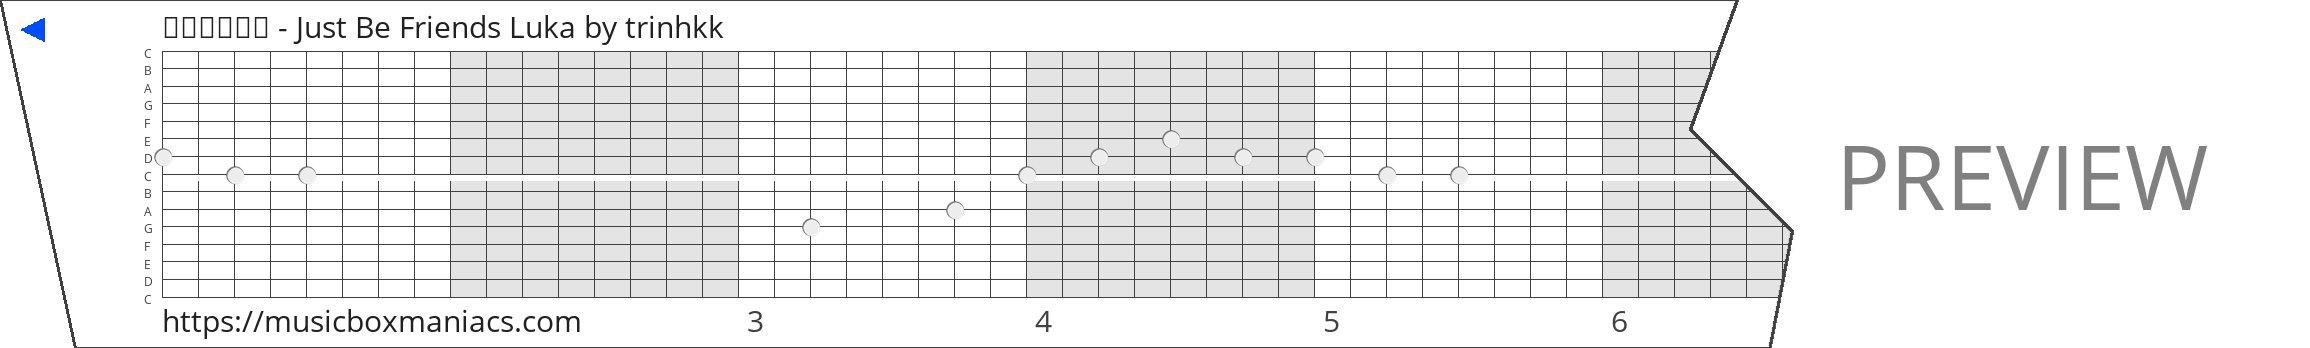 𝕞𝕚𝕤𝕥𝕚𝕚 - Just Be Friends Luka 15 note music box paper strip